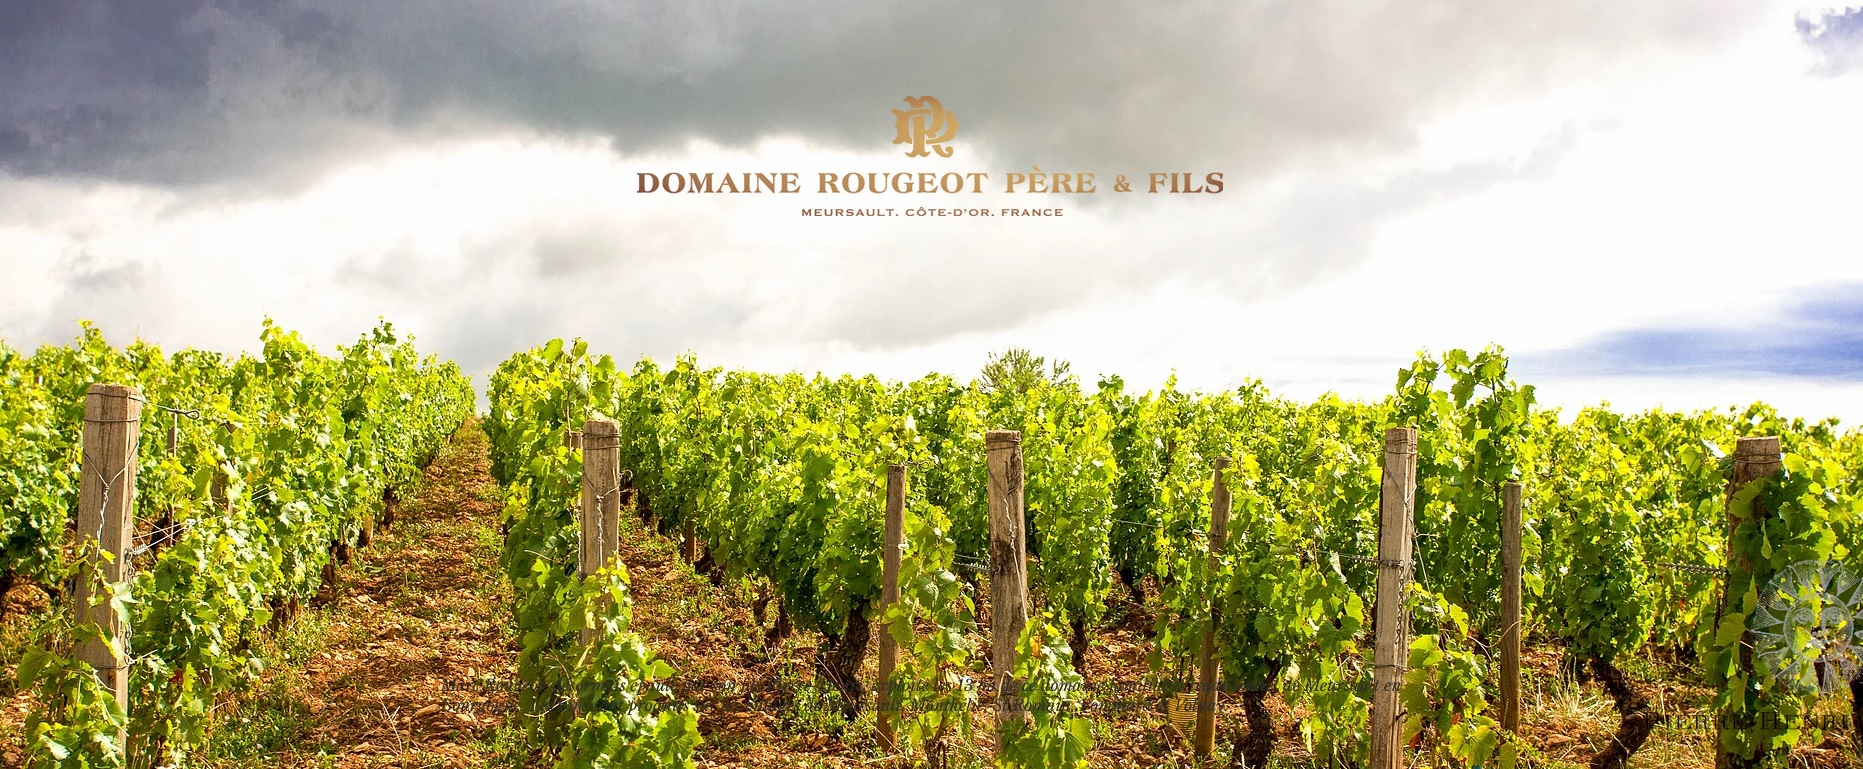 Domaine-Rougeot